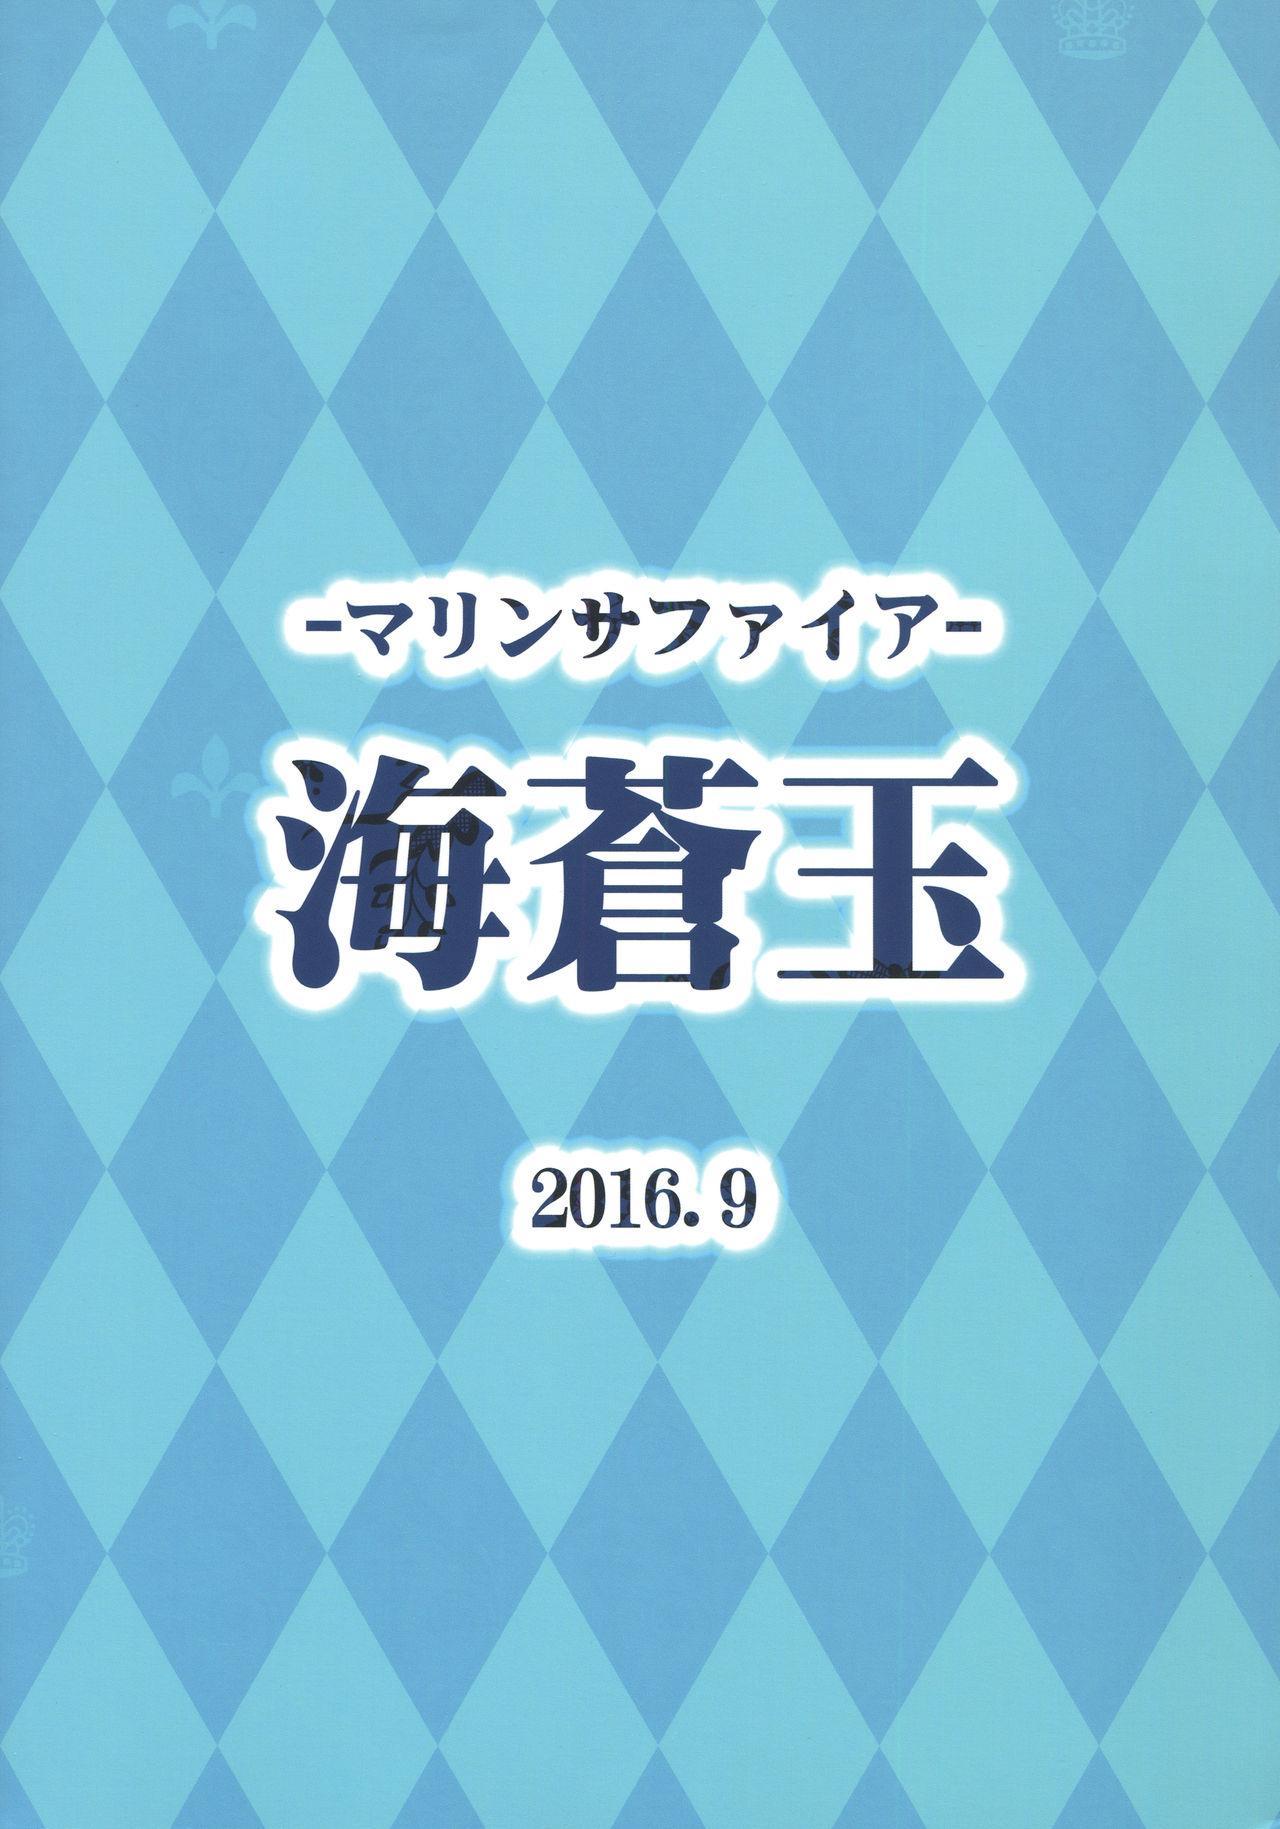 Rensou Harugatari 16 21